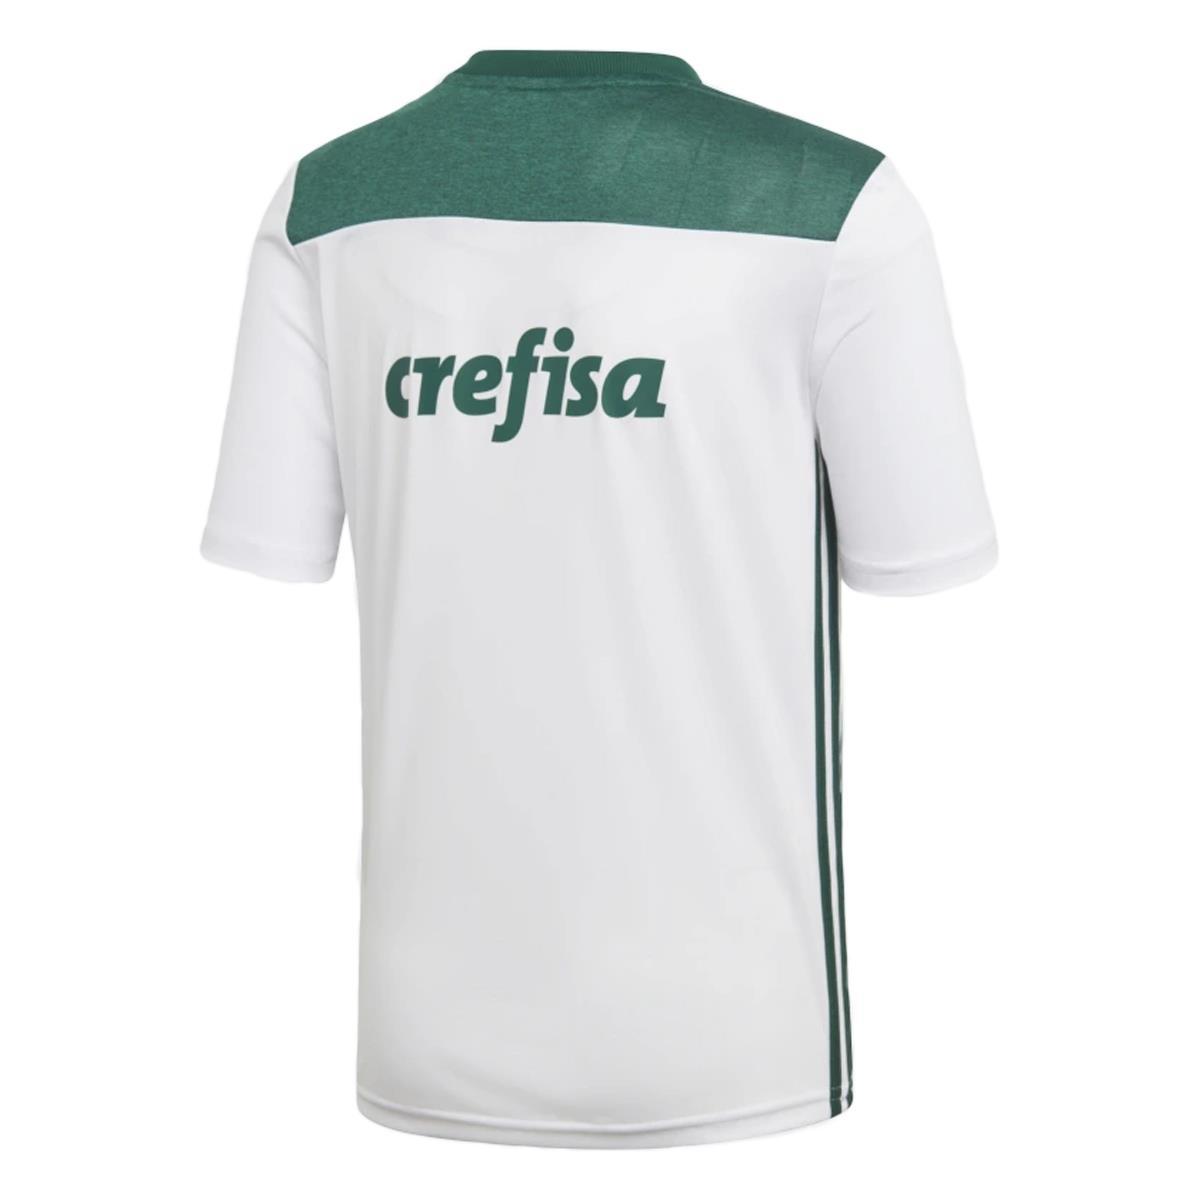 befa8739ce Camisa Adidas Palmeiras II 2018 Infantil